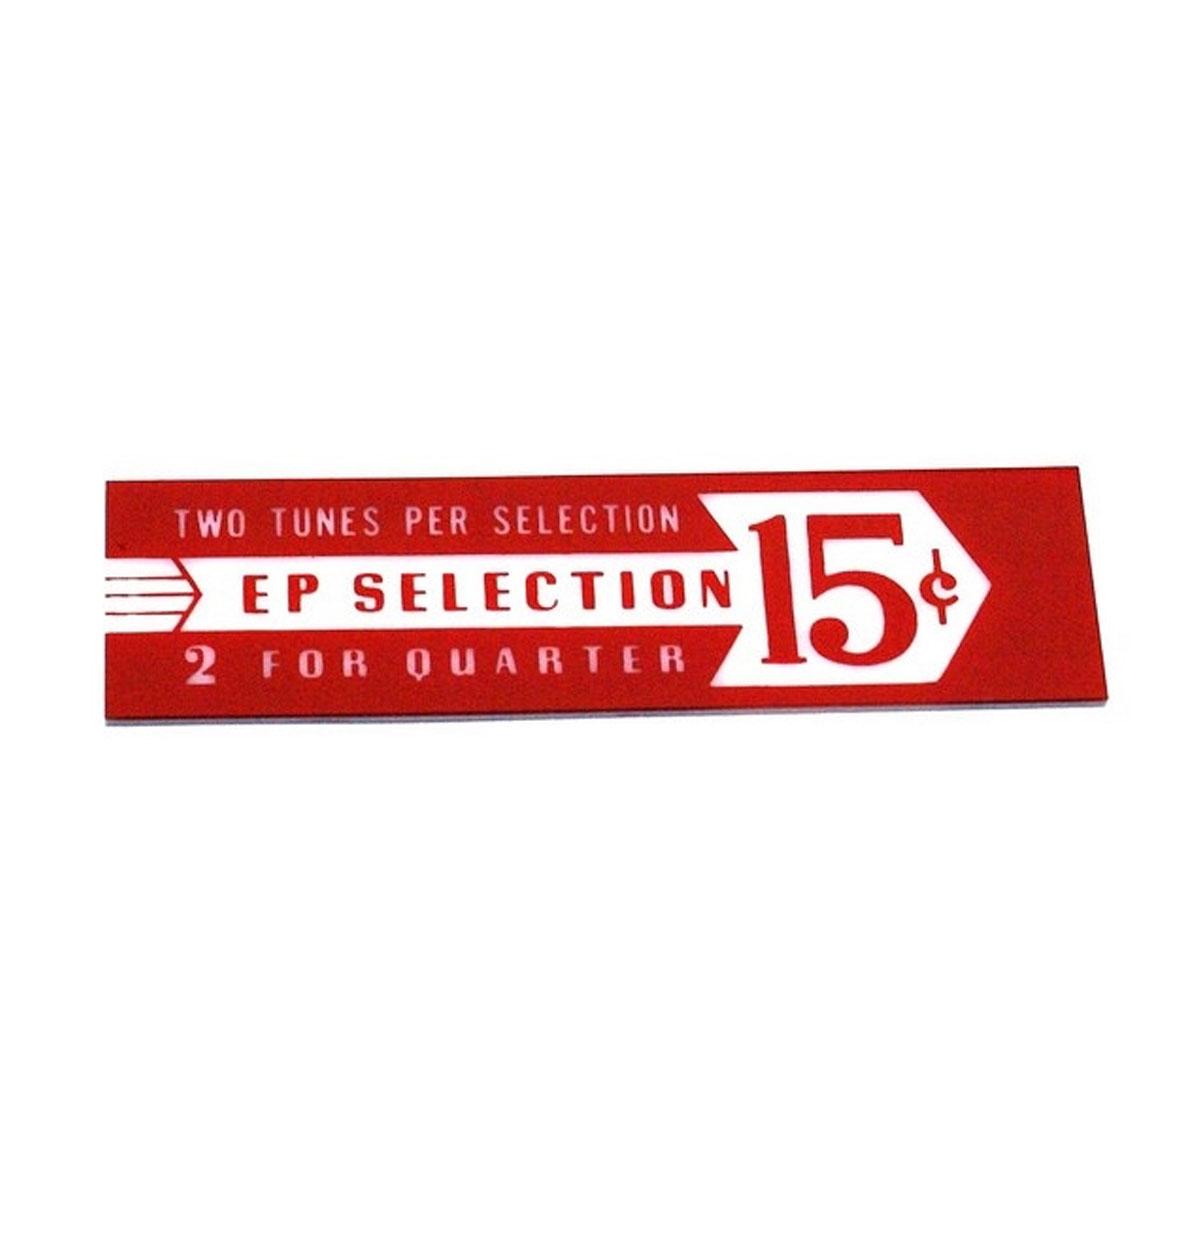 Seeburg EP prijskaart in drum rood model V - VL - KD200 - Rechts